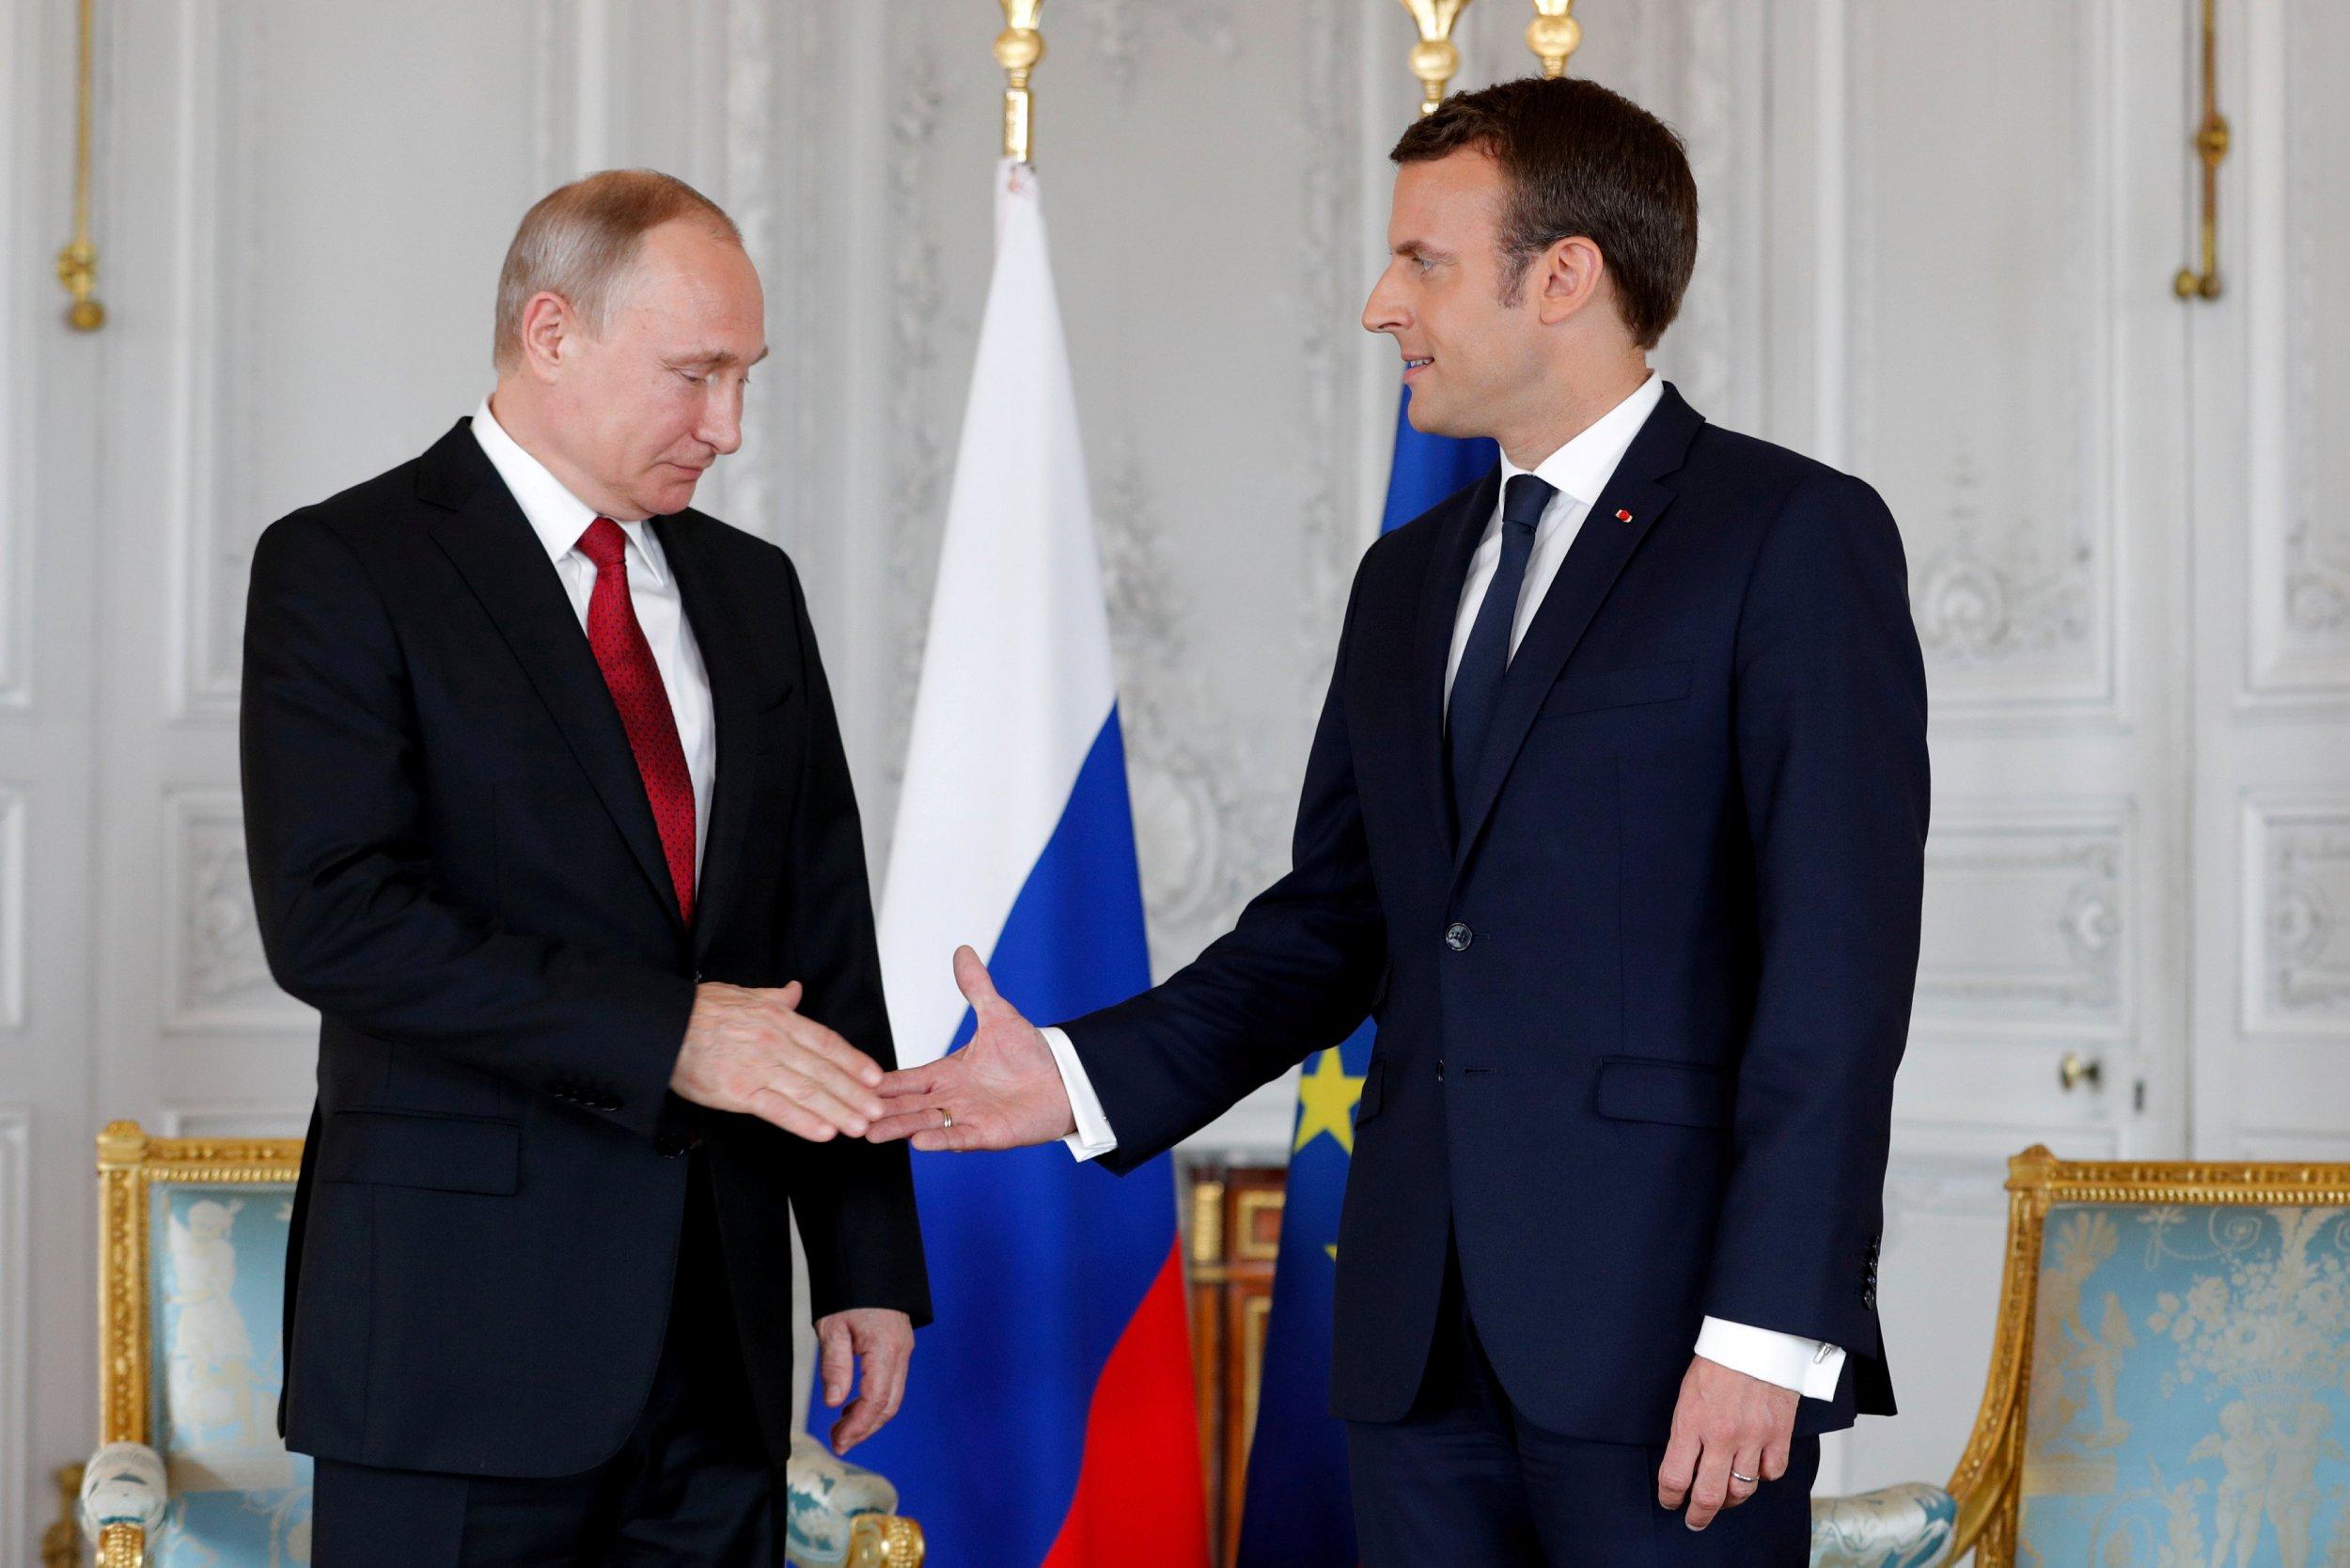 Putin and Macron